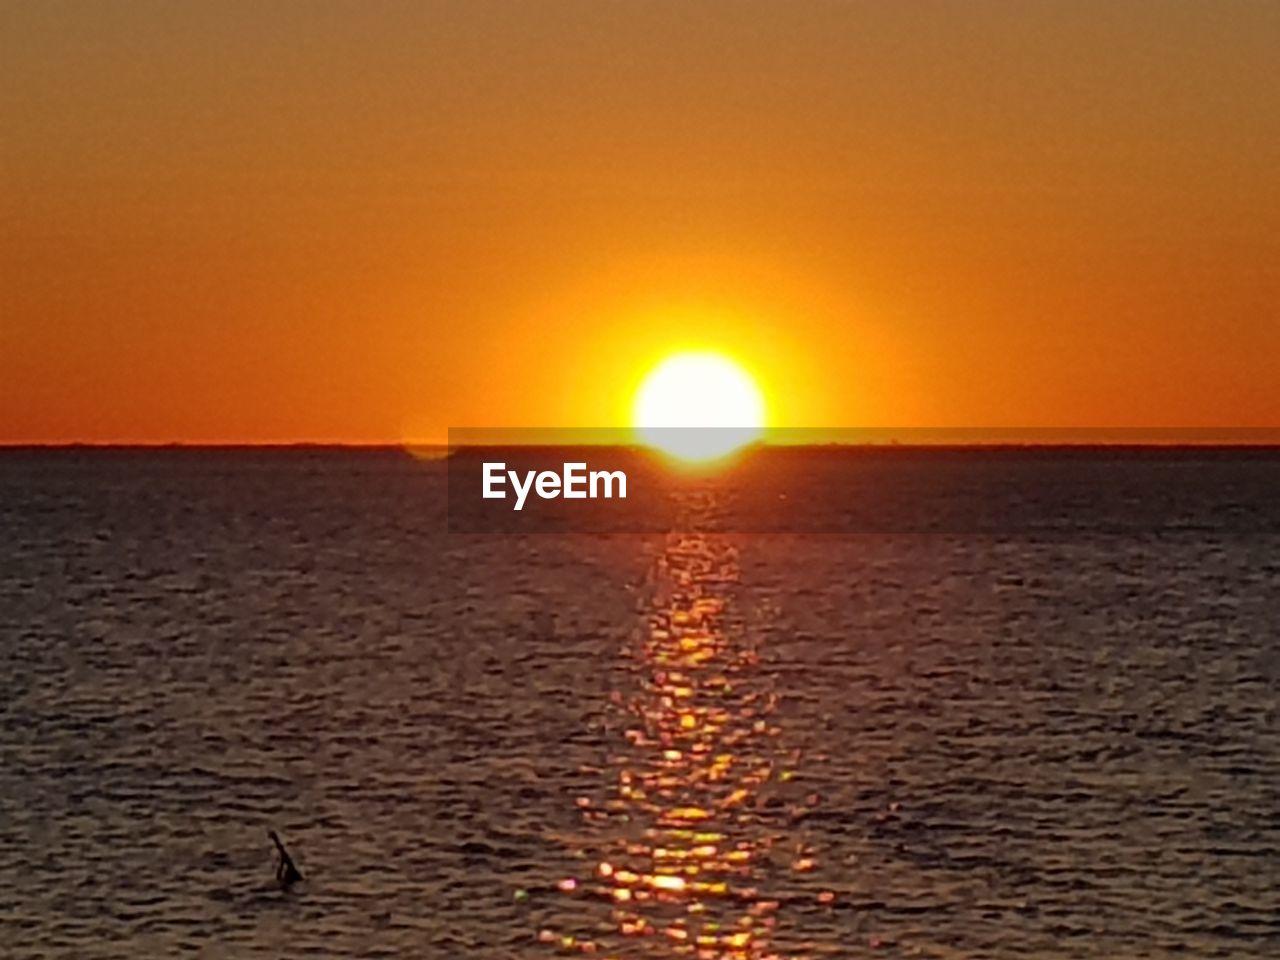 sun, sunset, orange color, sea, nature, scenics, sunlight, no people, sky, heat - temperature, tranquility, beauty in nature, clear sky, water, outdoors, landscape, horizon, beach, sand